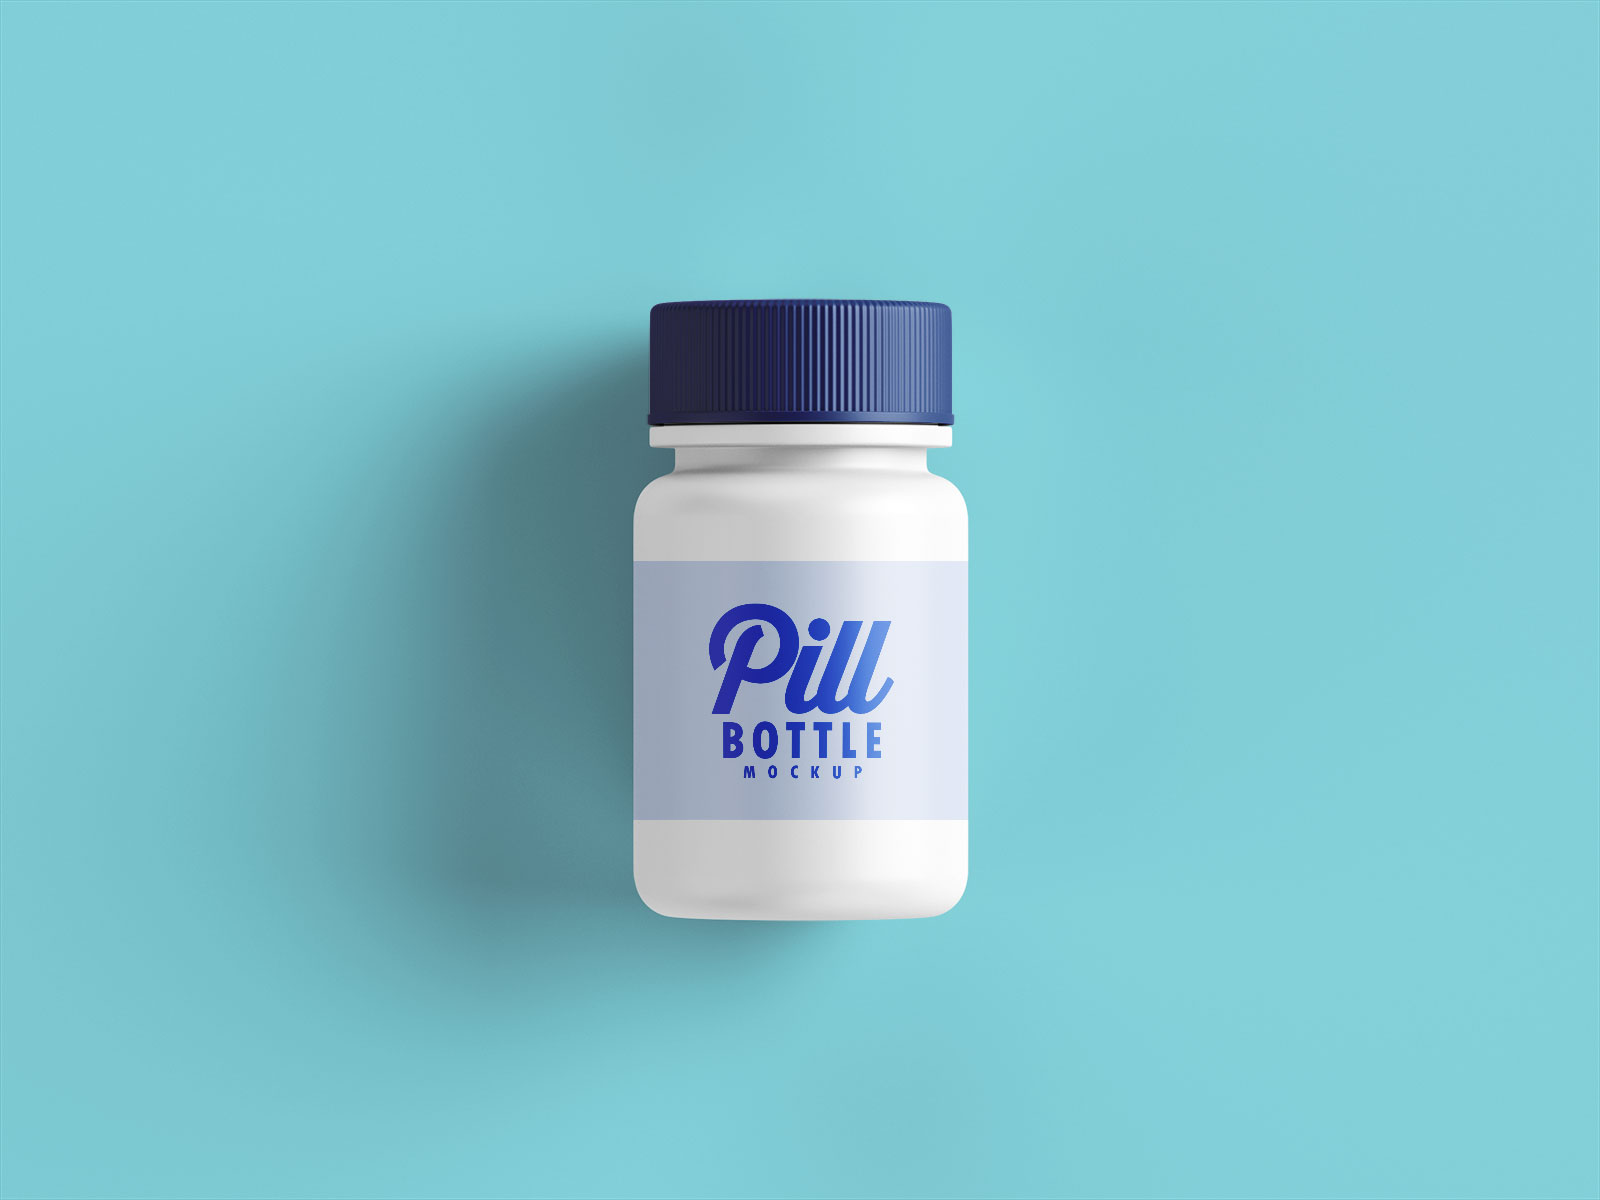 Free-Medicine-Pill-Bottle-Mockup-PSD-Set